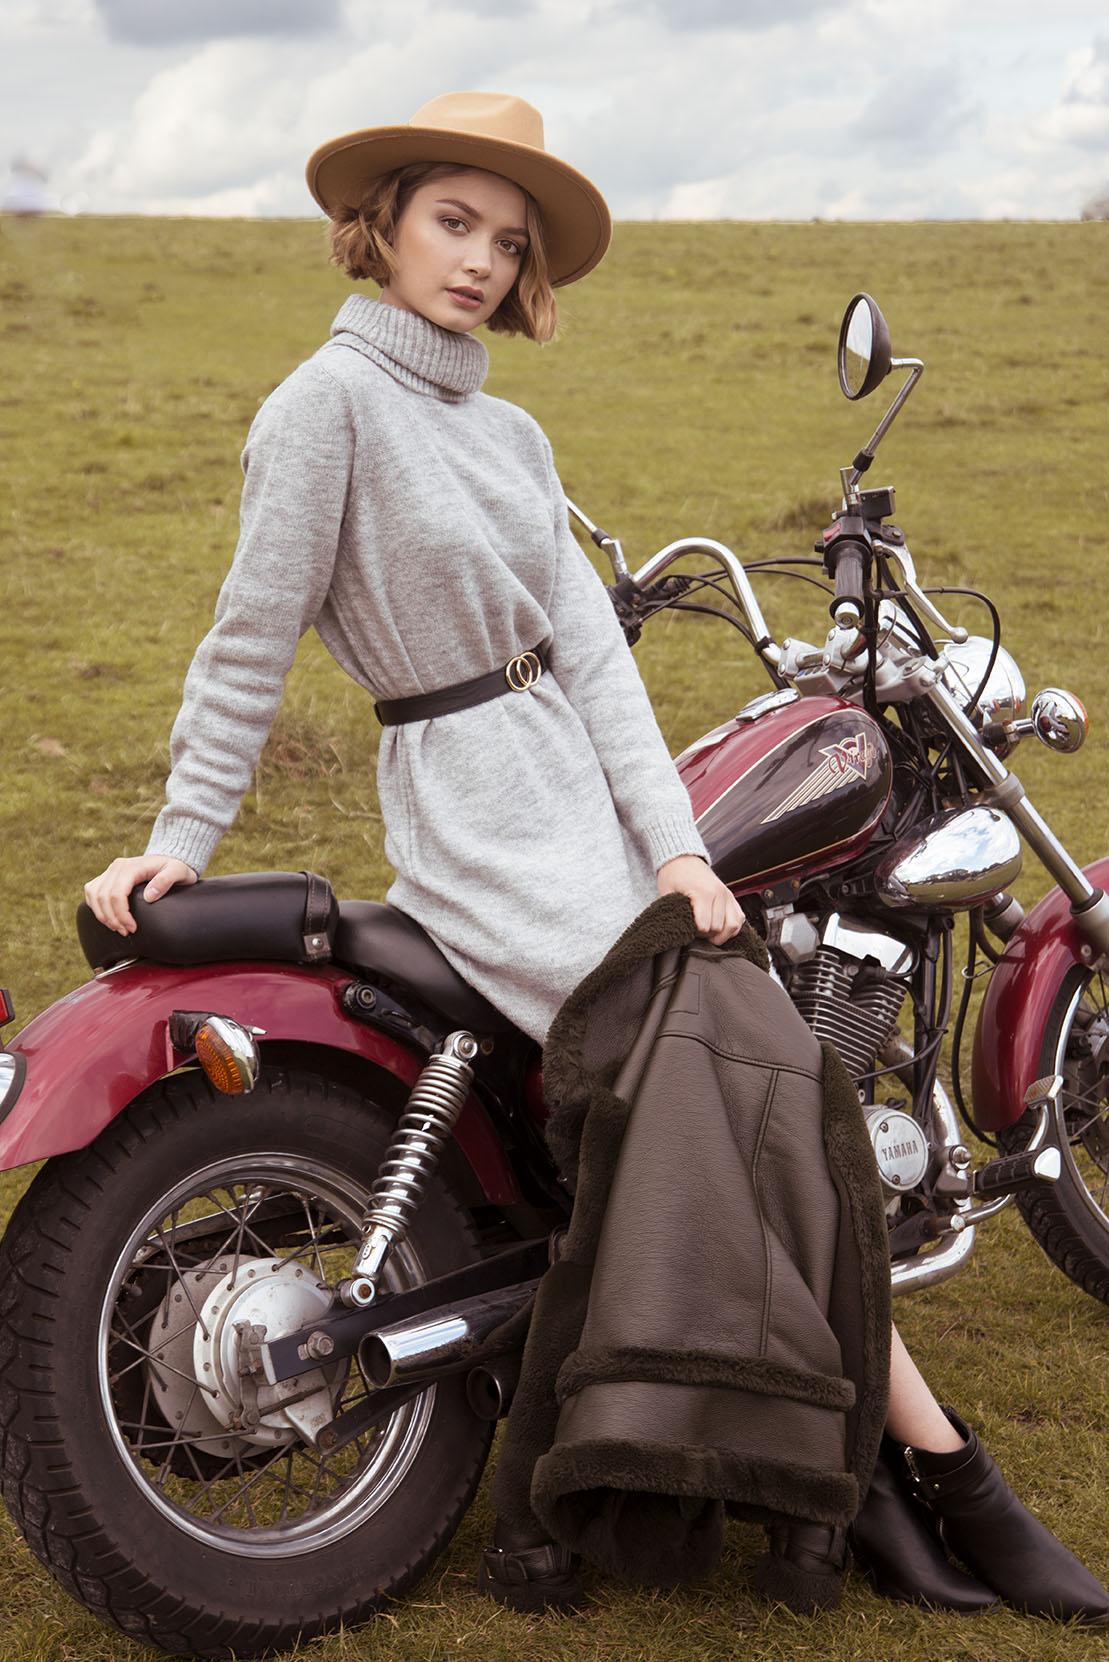 Motorbike Fashion Photoshoot Modelled by Tyla Paton By Grace Delnevo Cotswold fashion Photographer